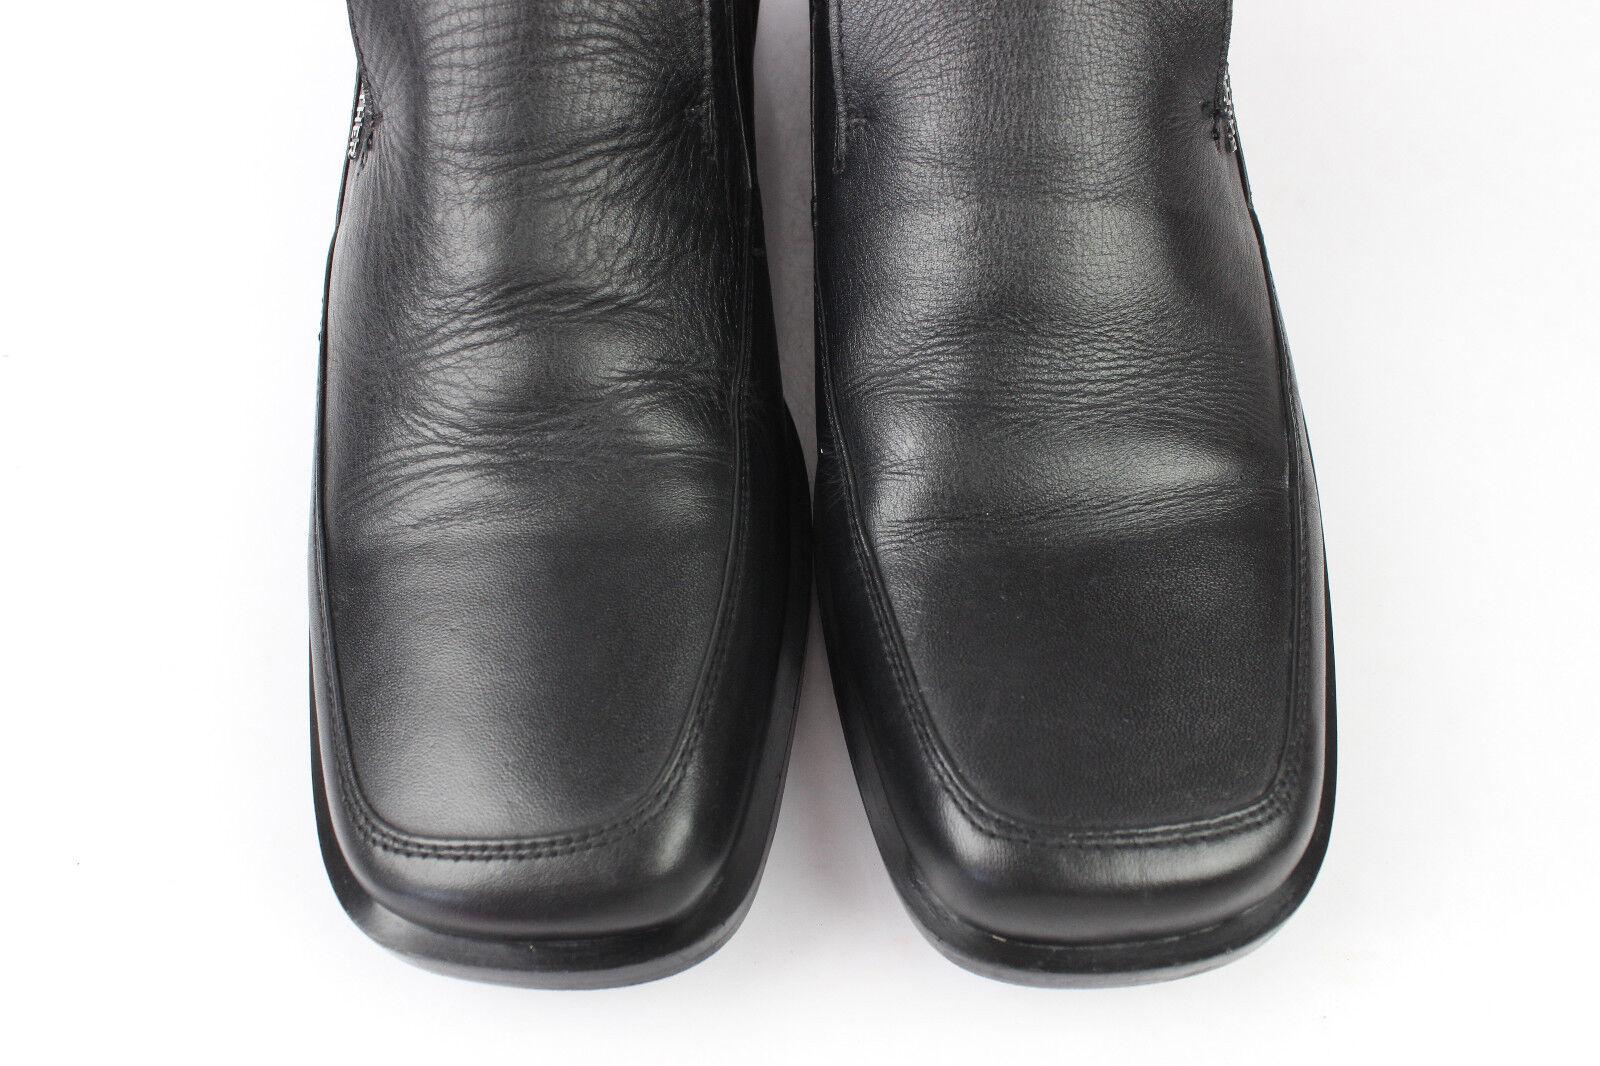 Mokassiner Leder PANTHER London schwarzes Leder Mokassiner T 41 sehr guter Zustand 0dbd95